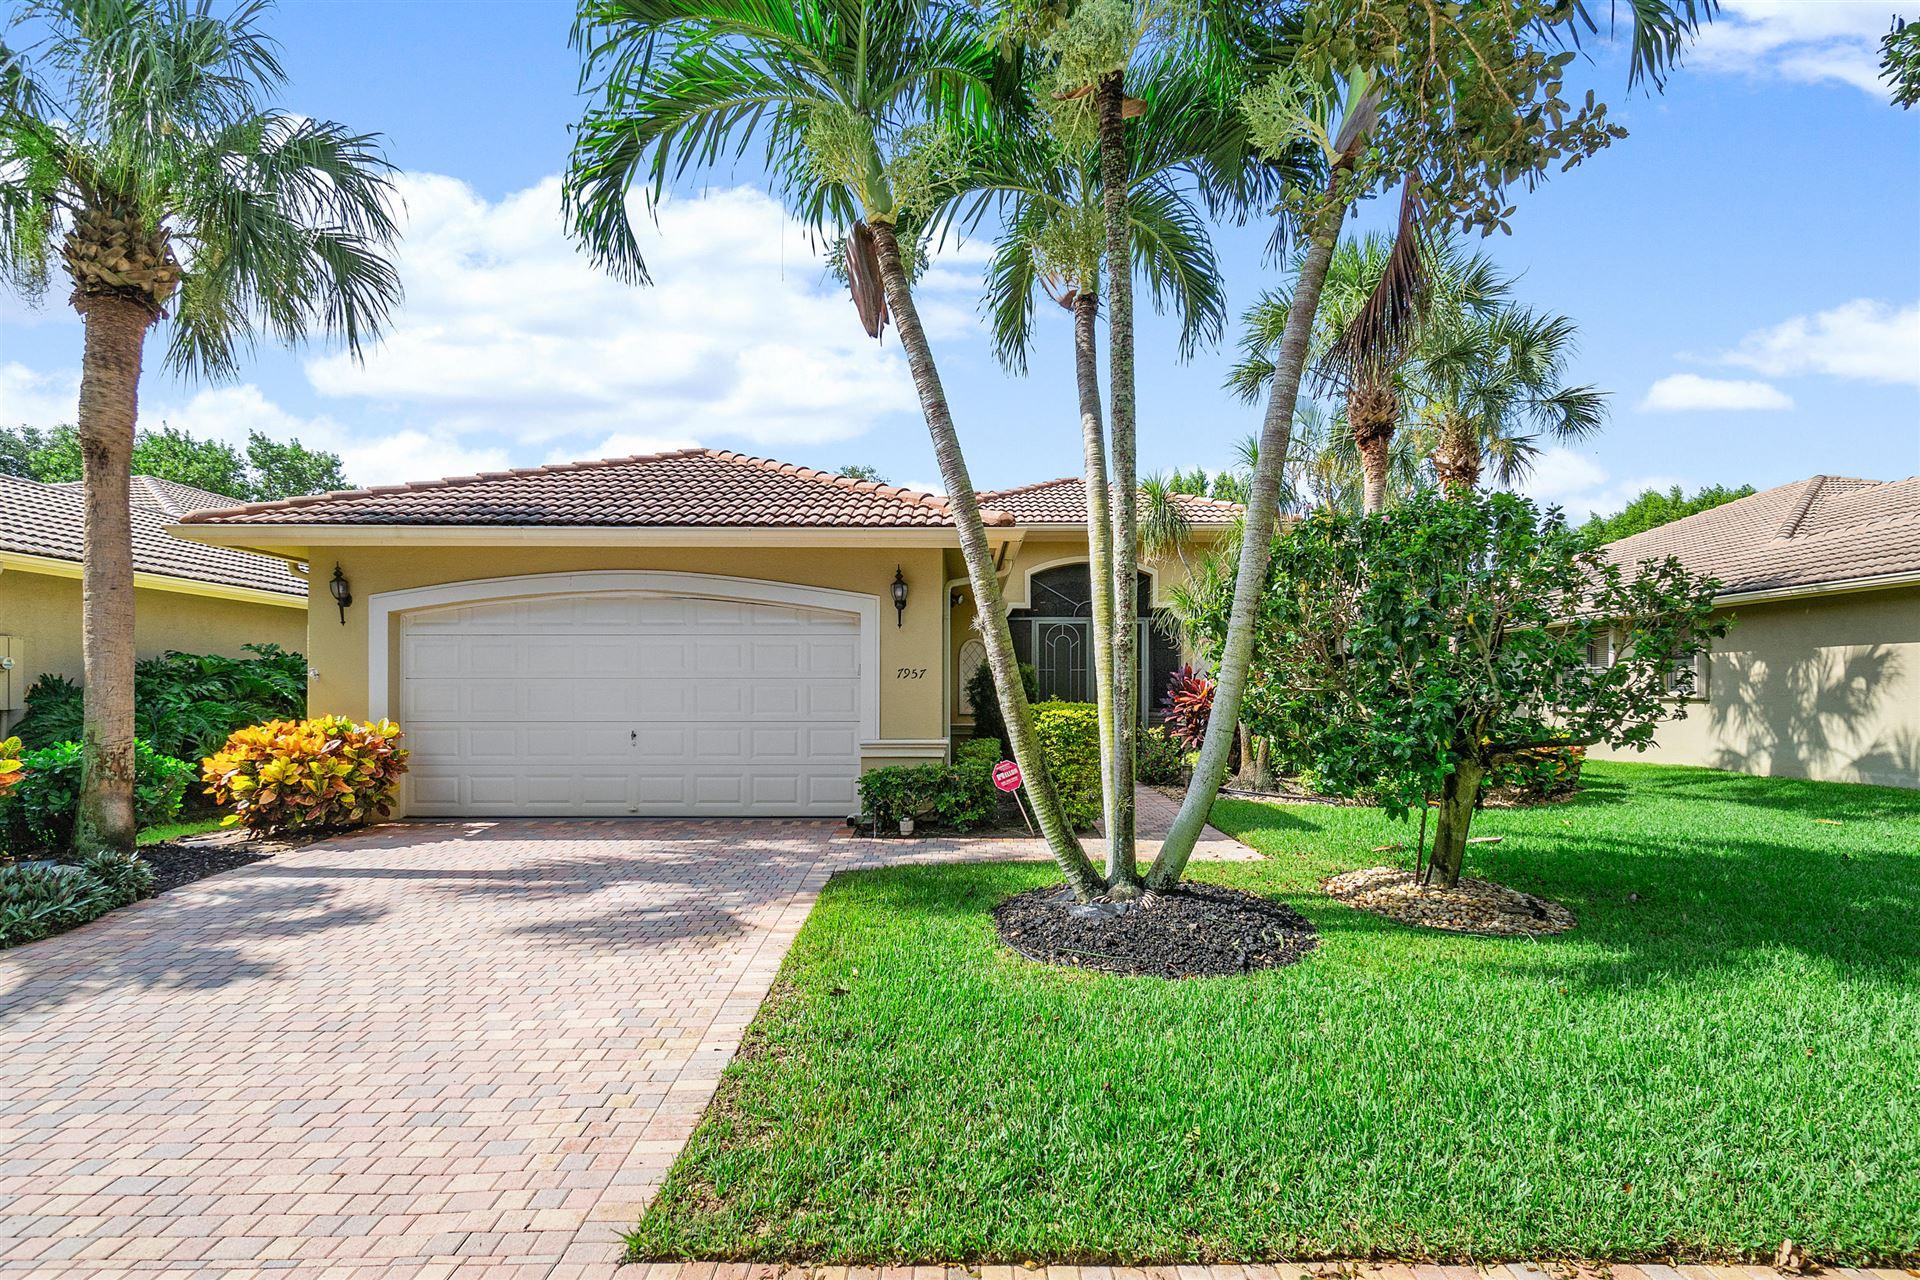 7957 Via Grande, Boynton Beach, FL 33437 - #: RX-10644673